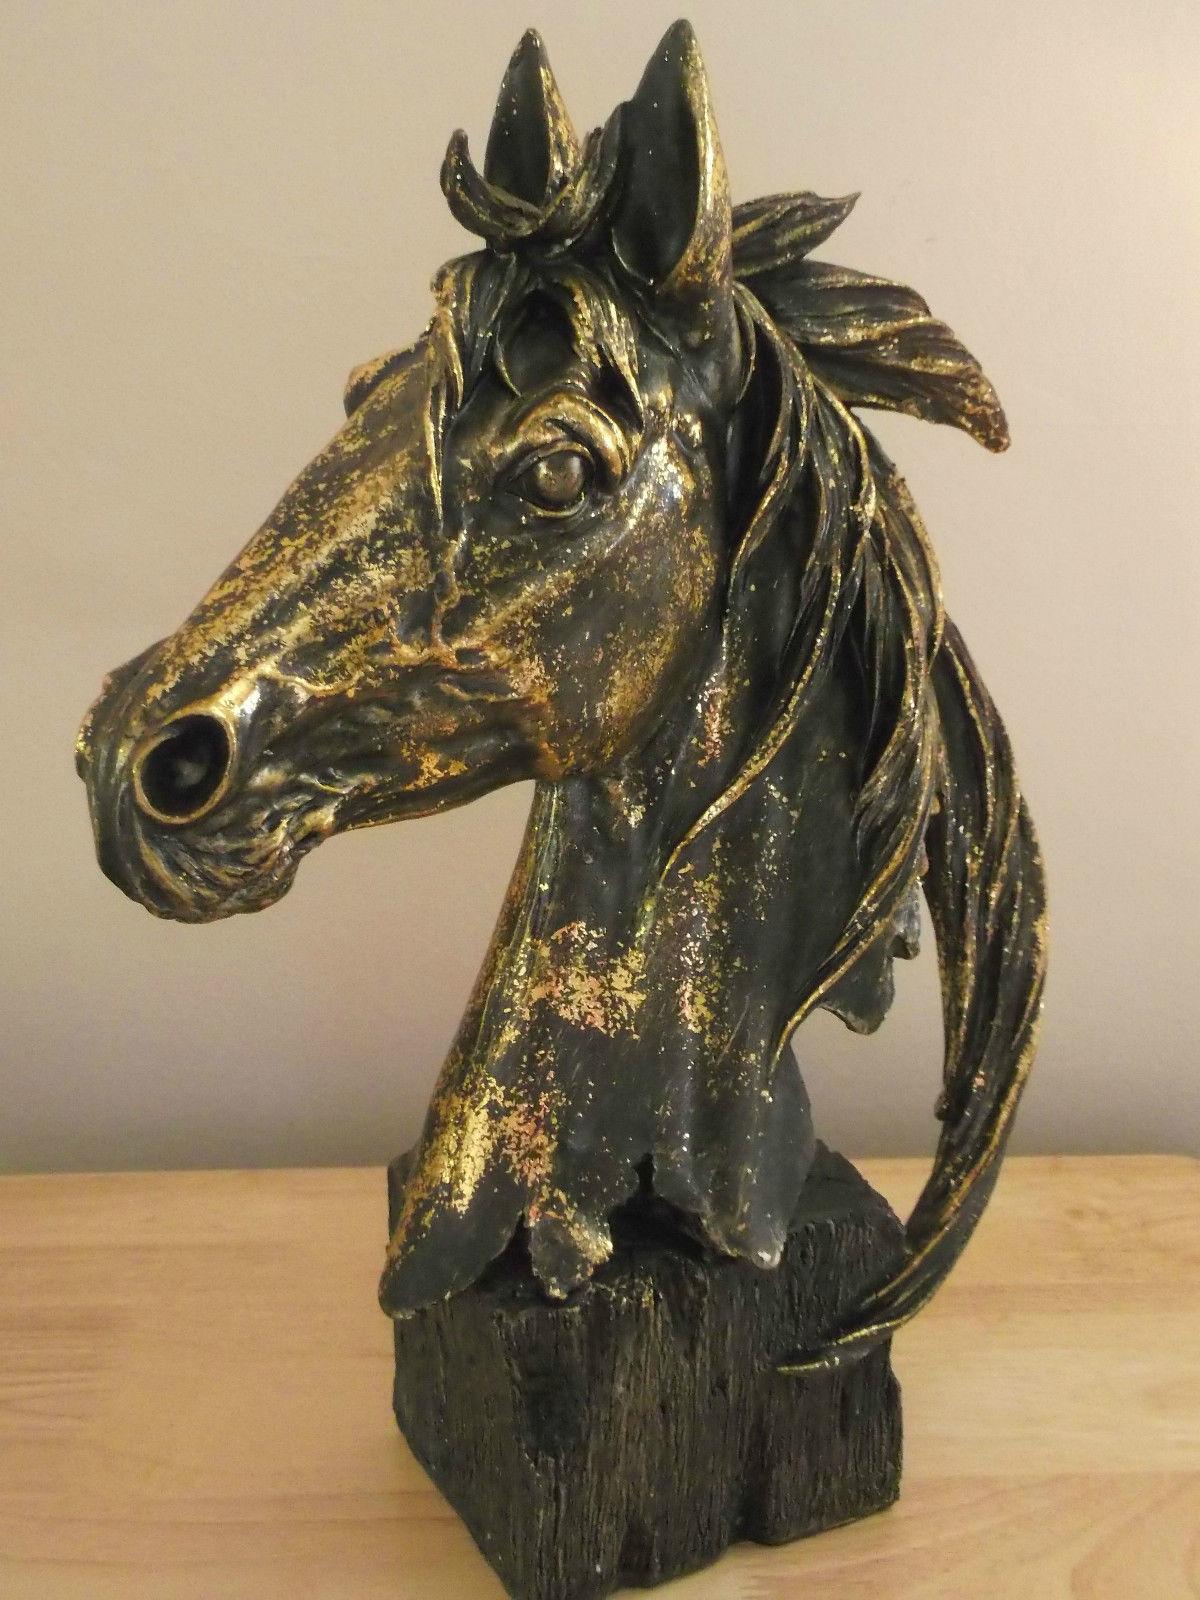 New Large Horse Head Bust Statue Ornament Sculpture